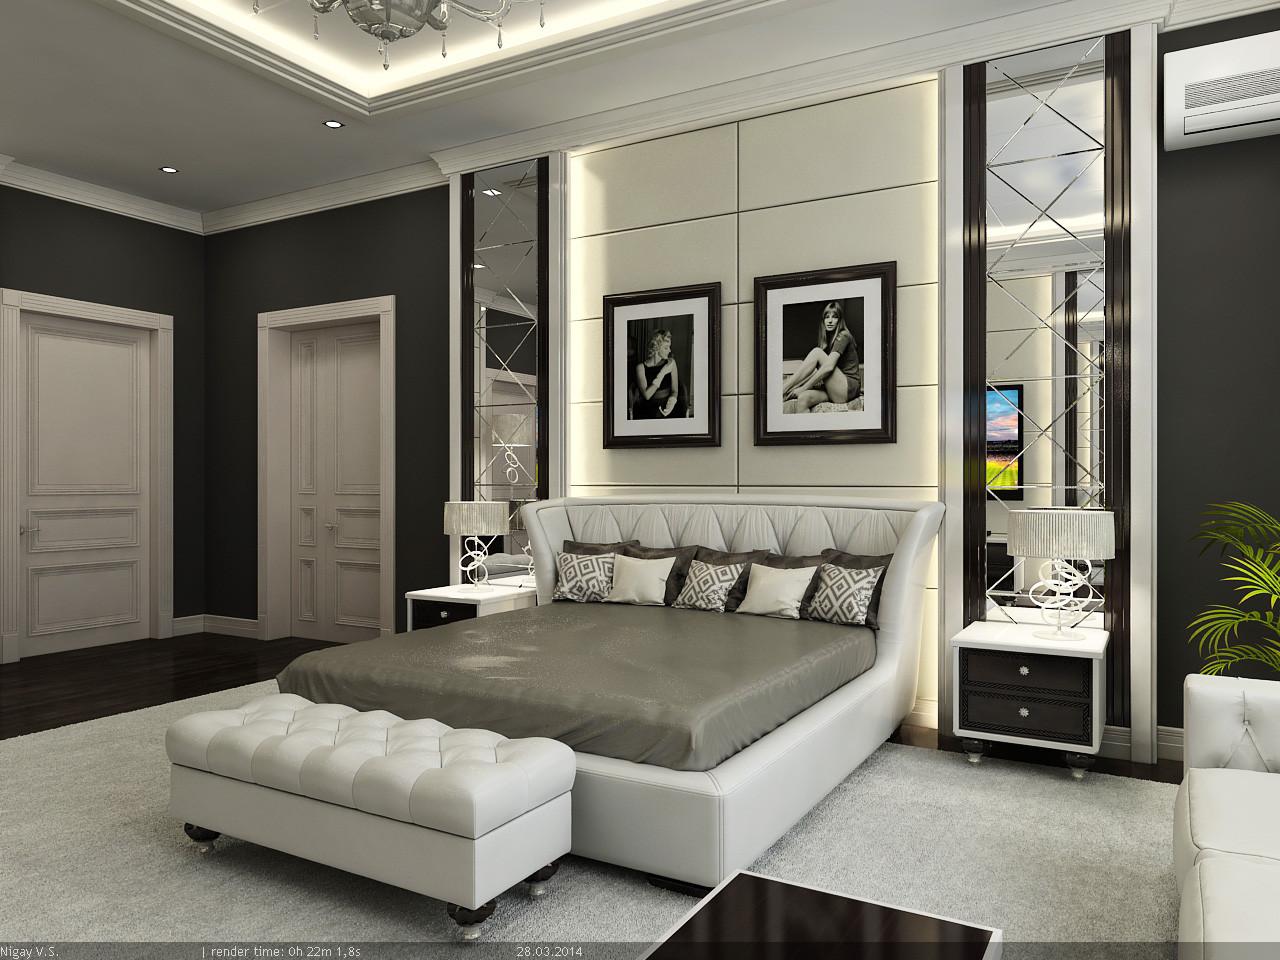 interior - master bedroom 3d model on Model Bedroom Design  id=15814